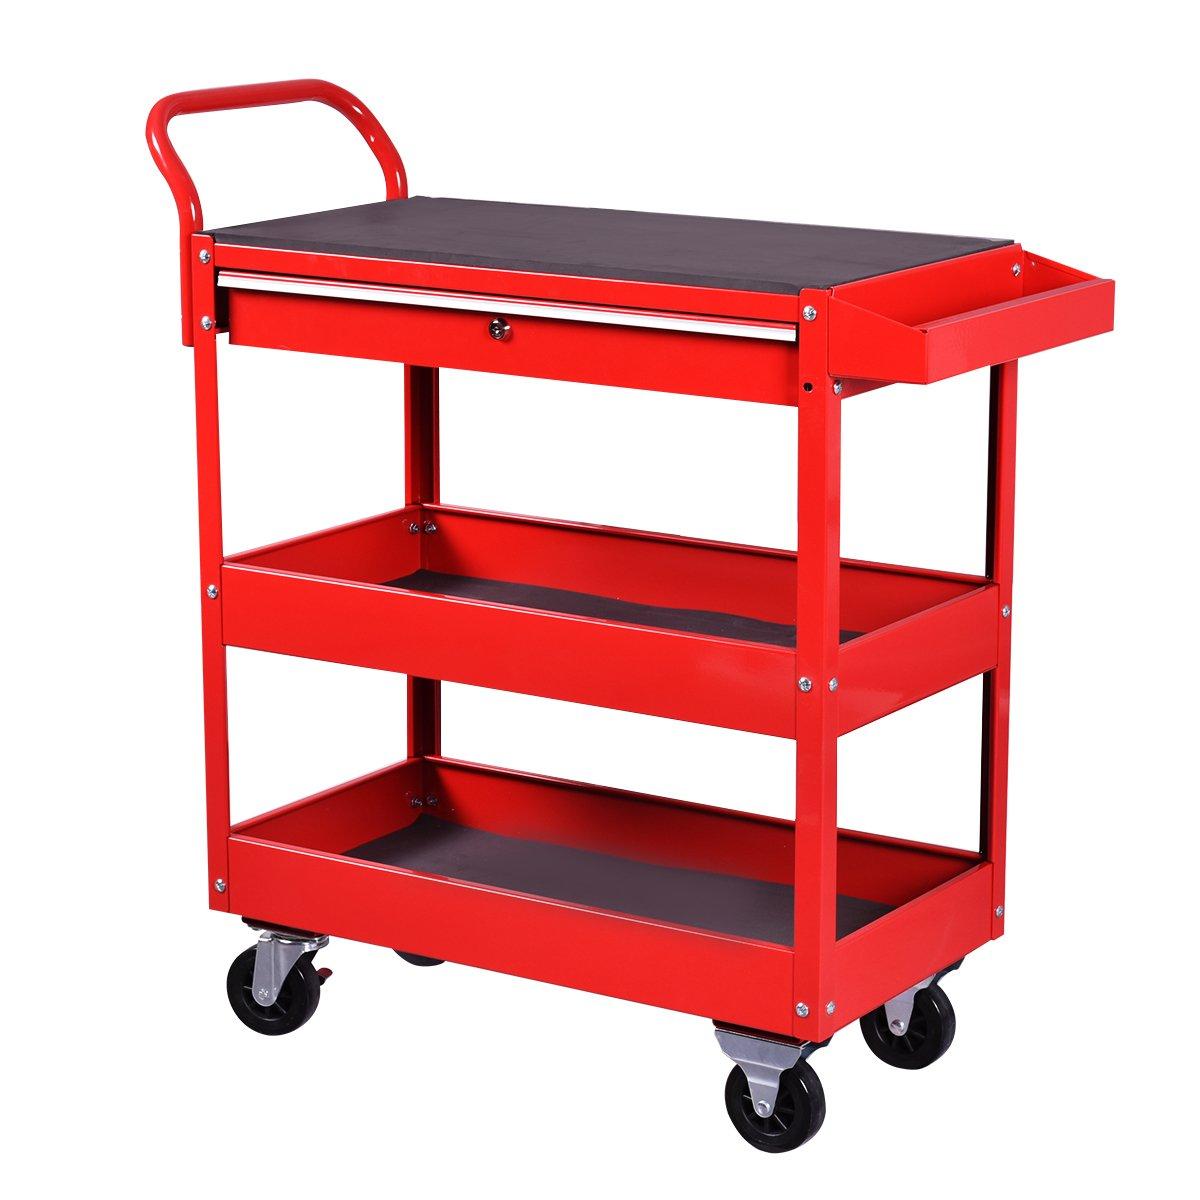 Goplus Tool Cart Rolling 36-Inch Steel Tool Chest Box Wheels Trays w/ Locking Drawer, Red